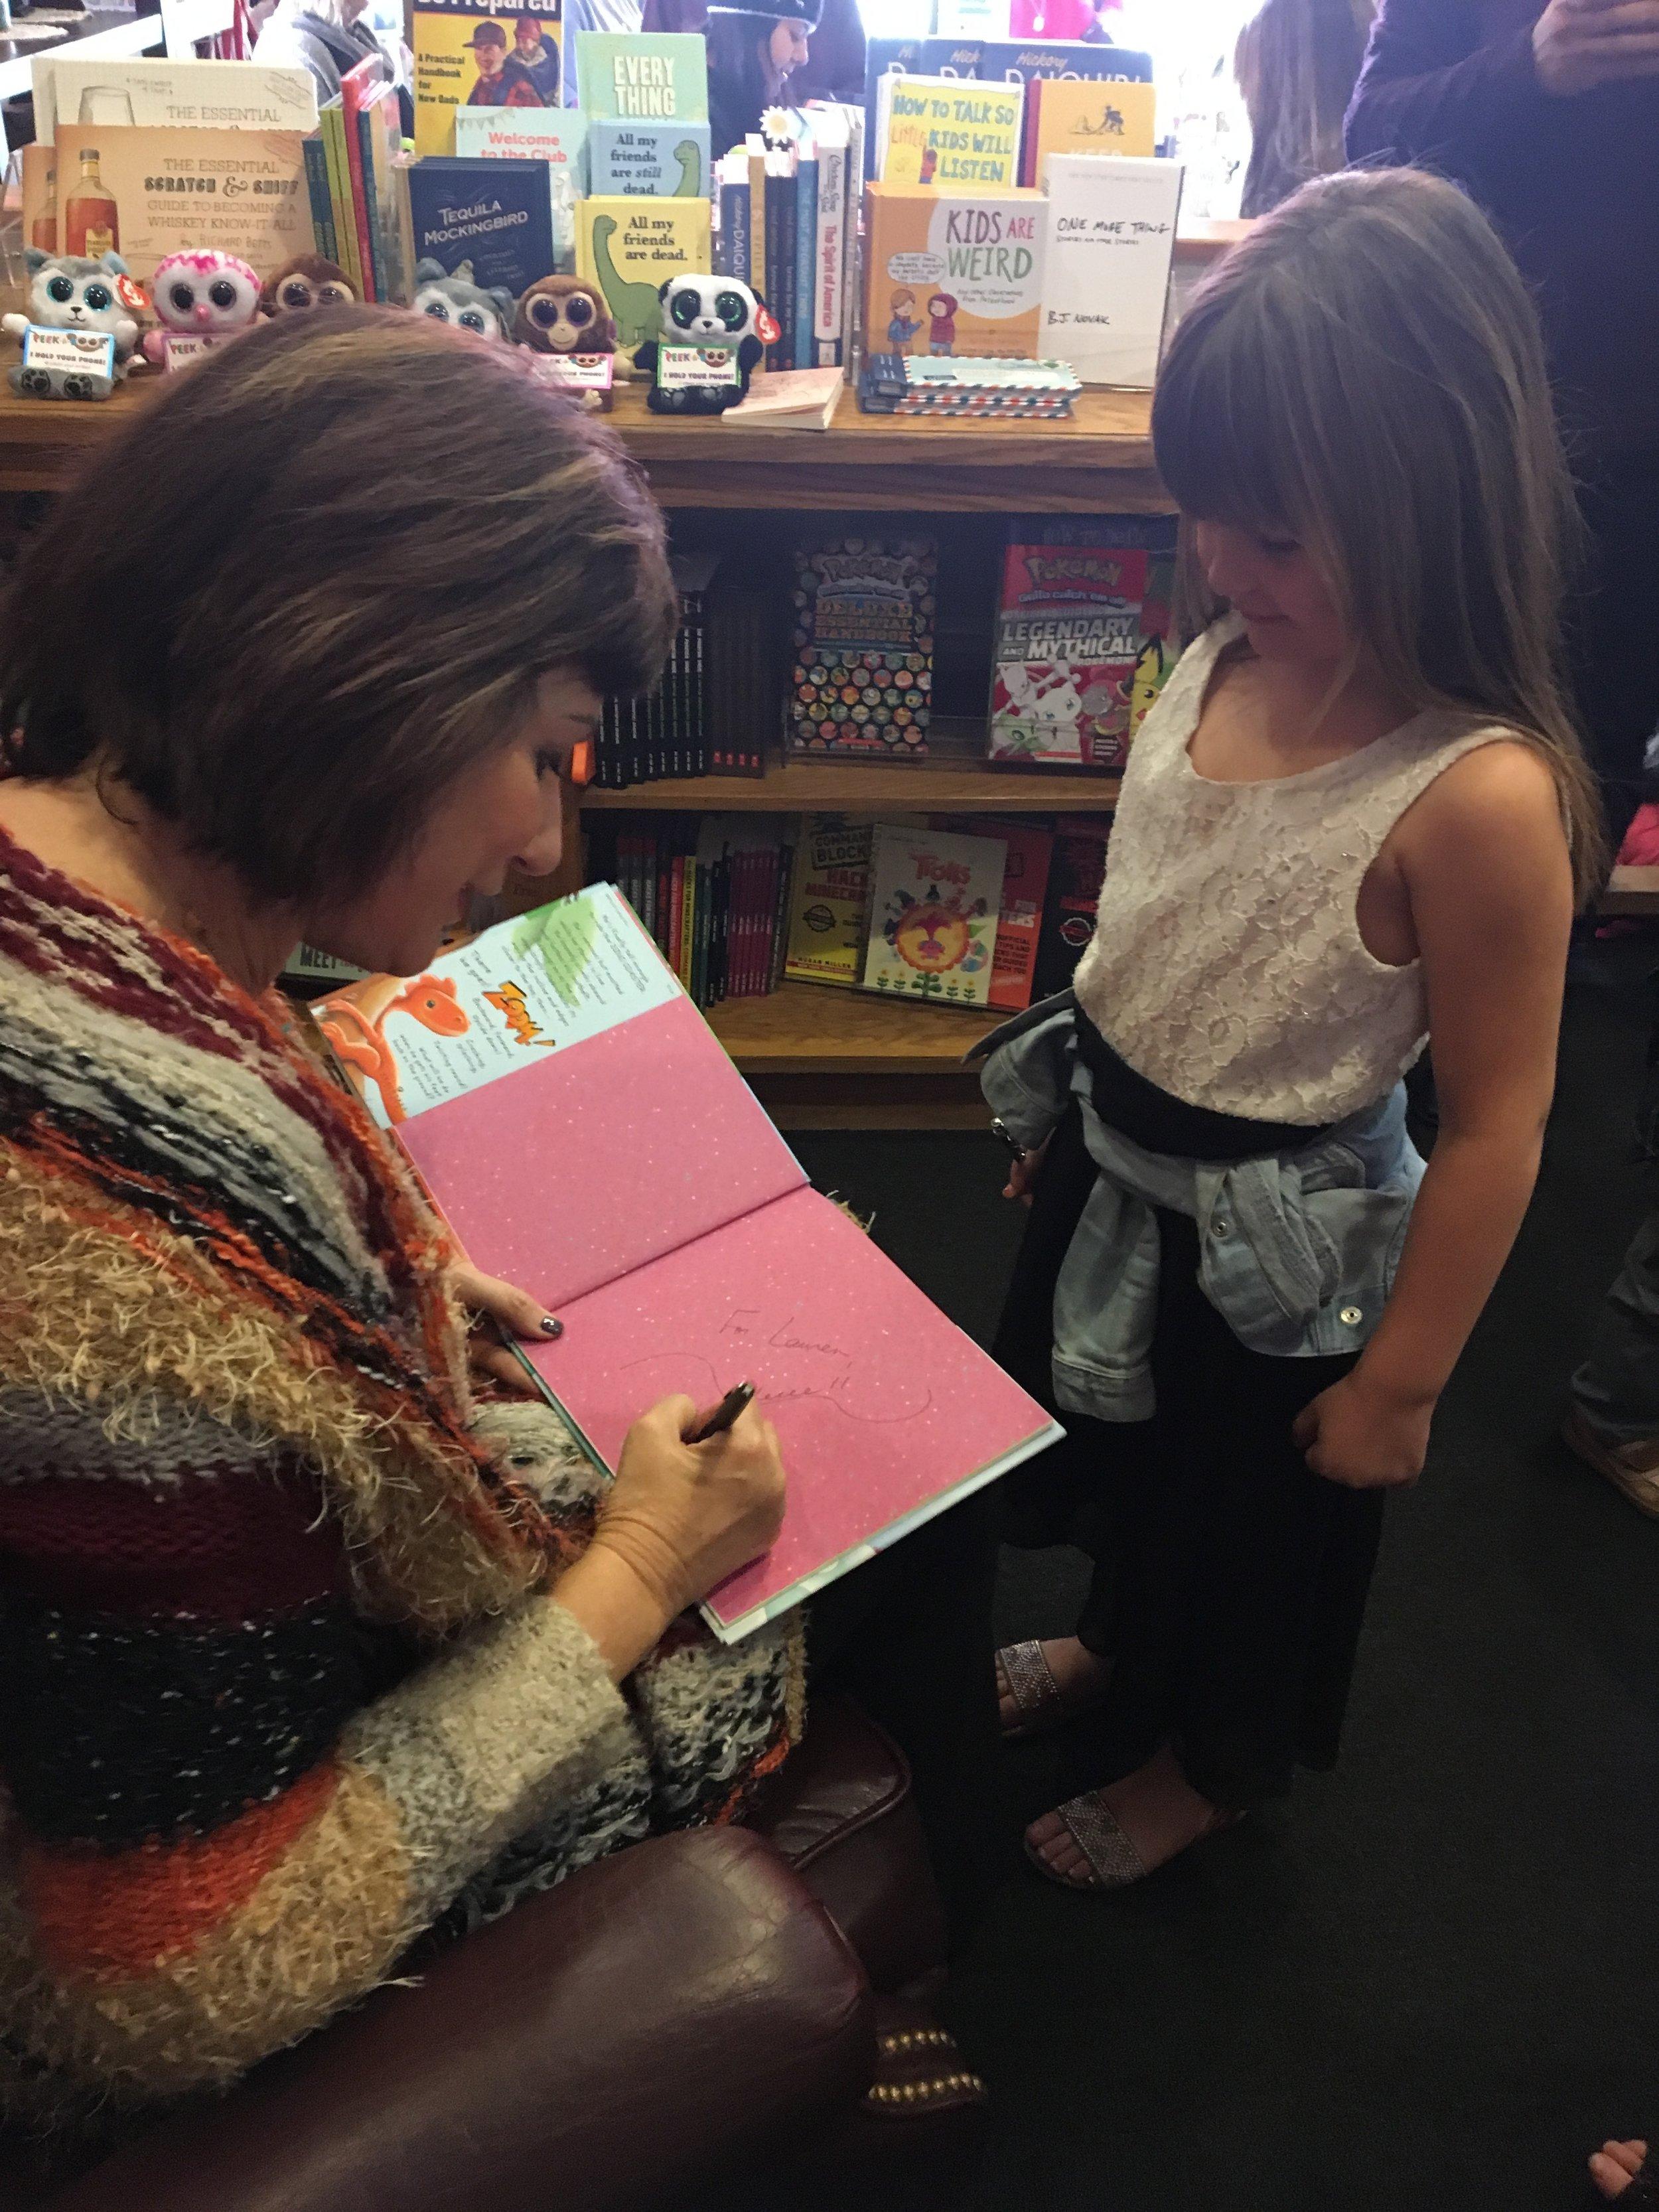 a book singing at Frugal Frigate, Diane's local indie bookstore